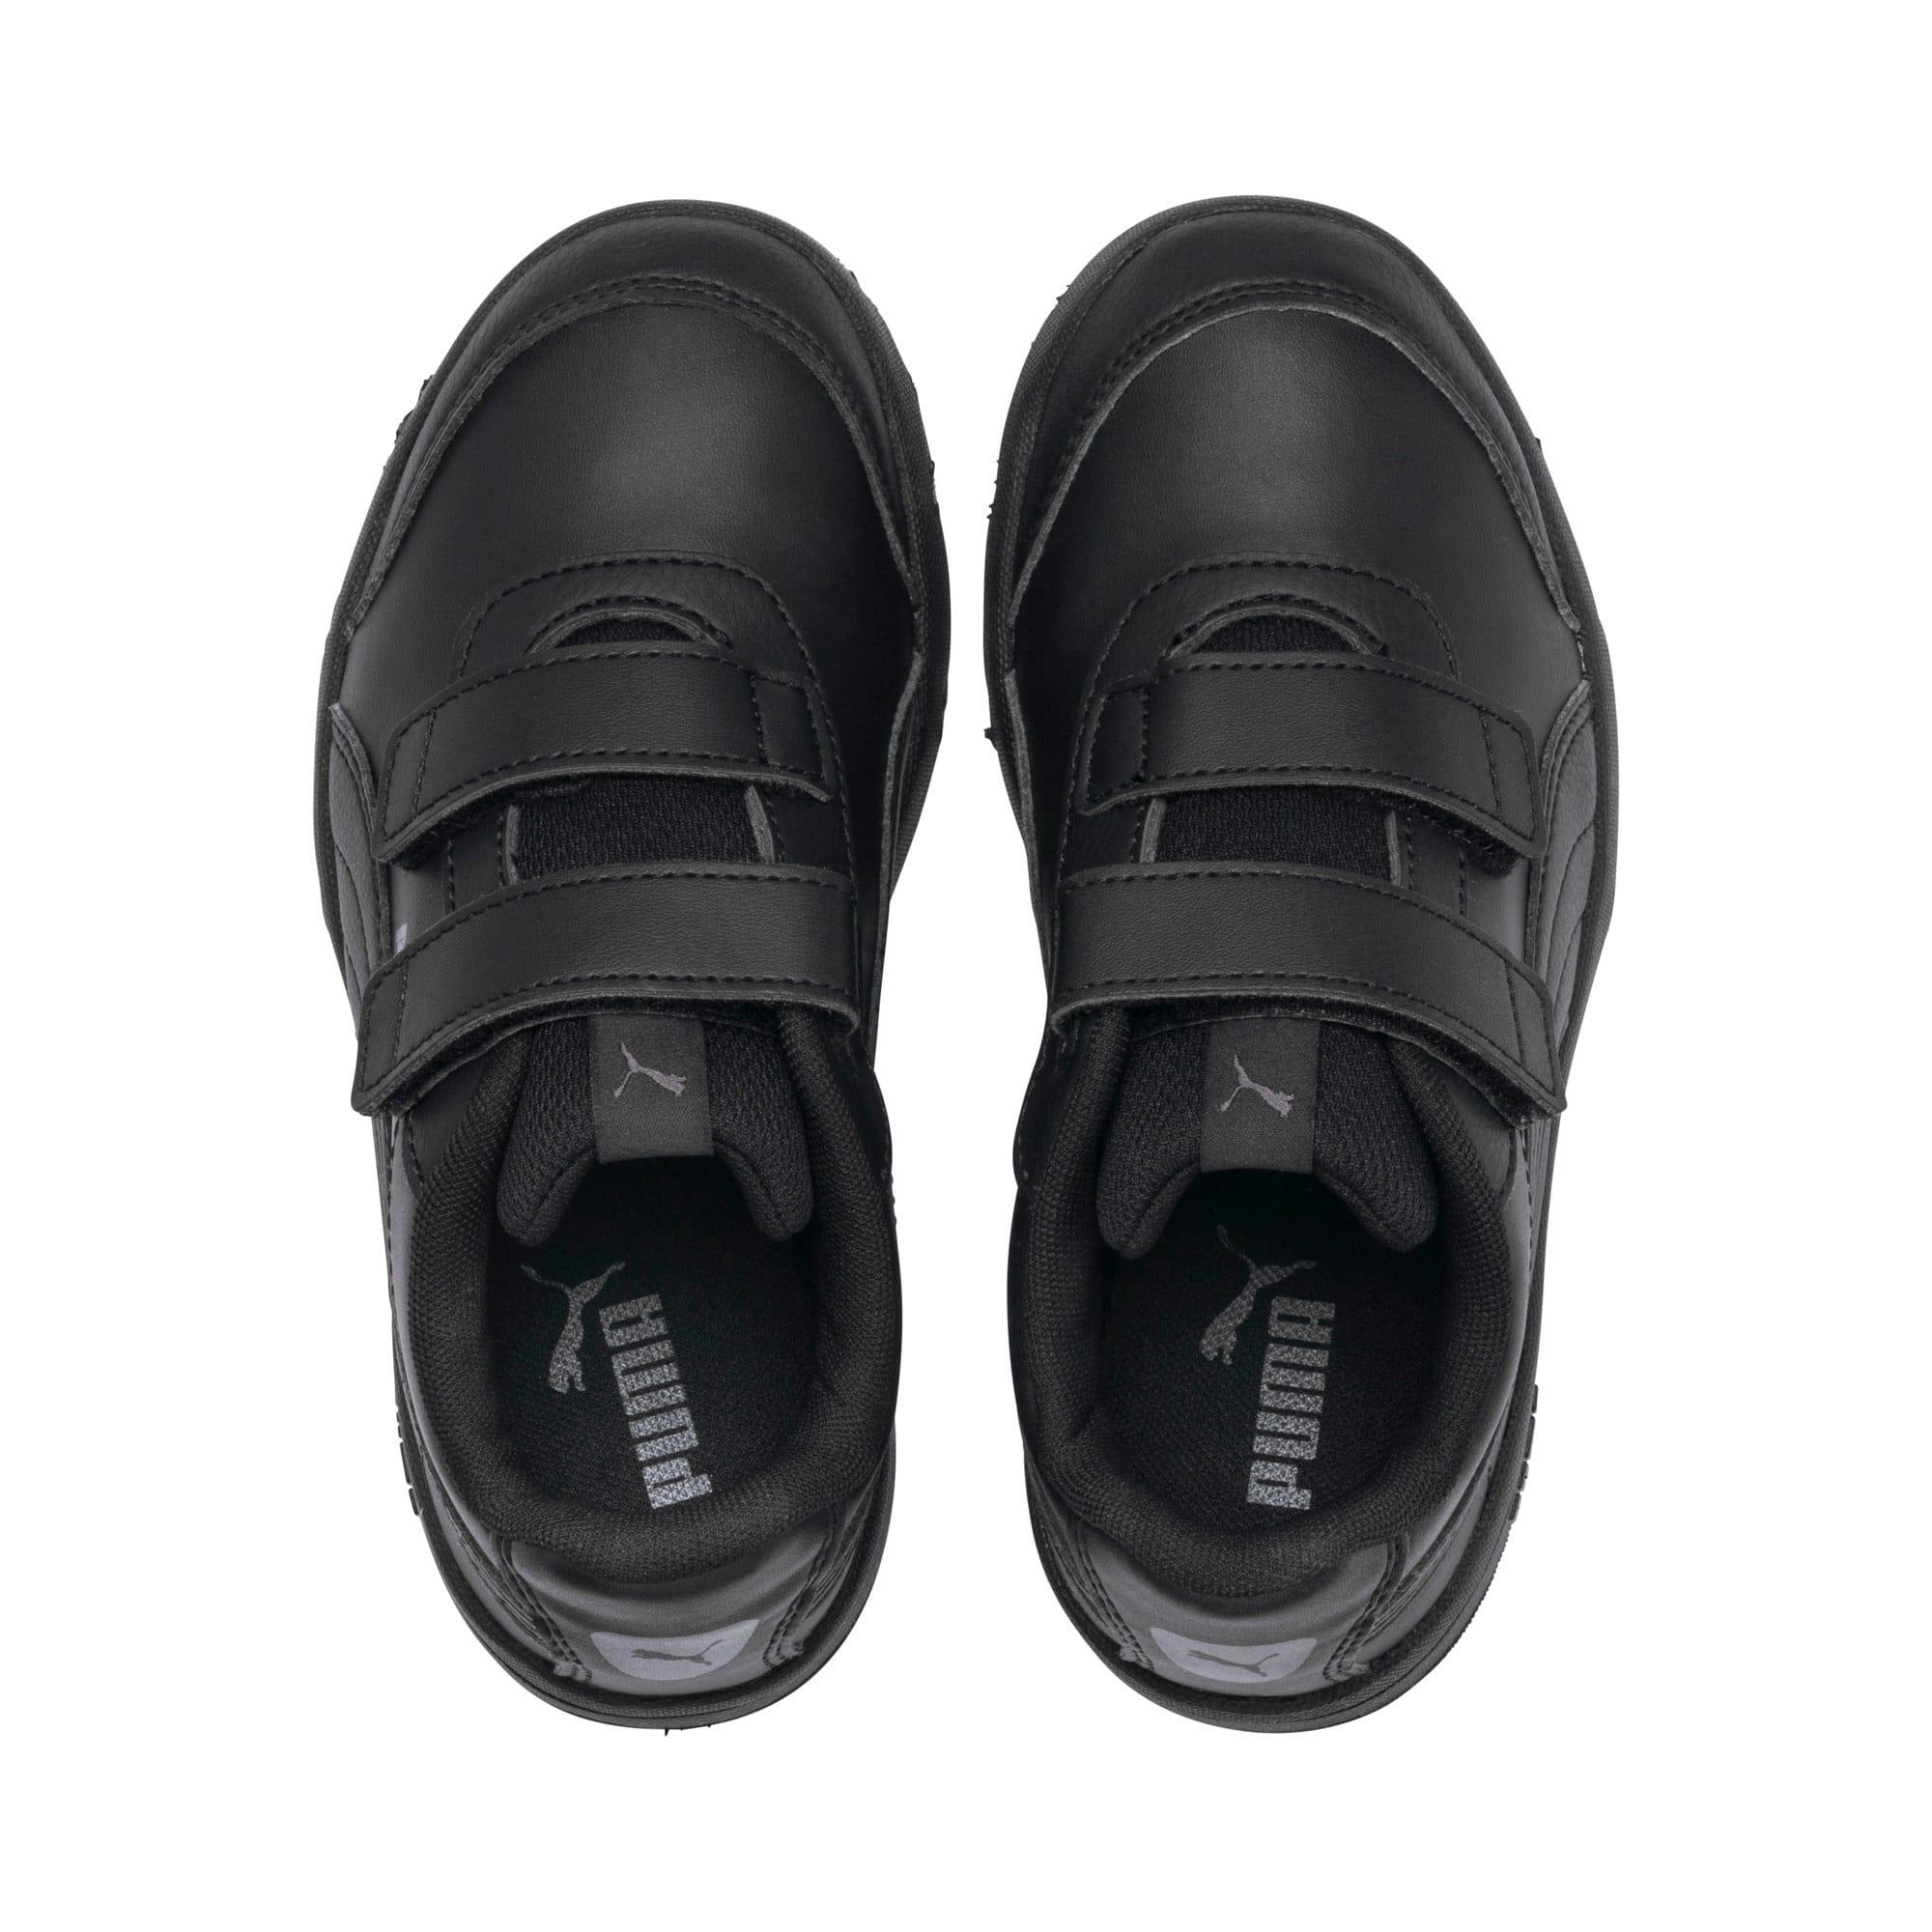 Thumbnail 6 of Stepfleex 2 SL VE V Kids Sneaker, Puma Black-Puma Black, medium